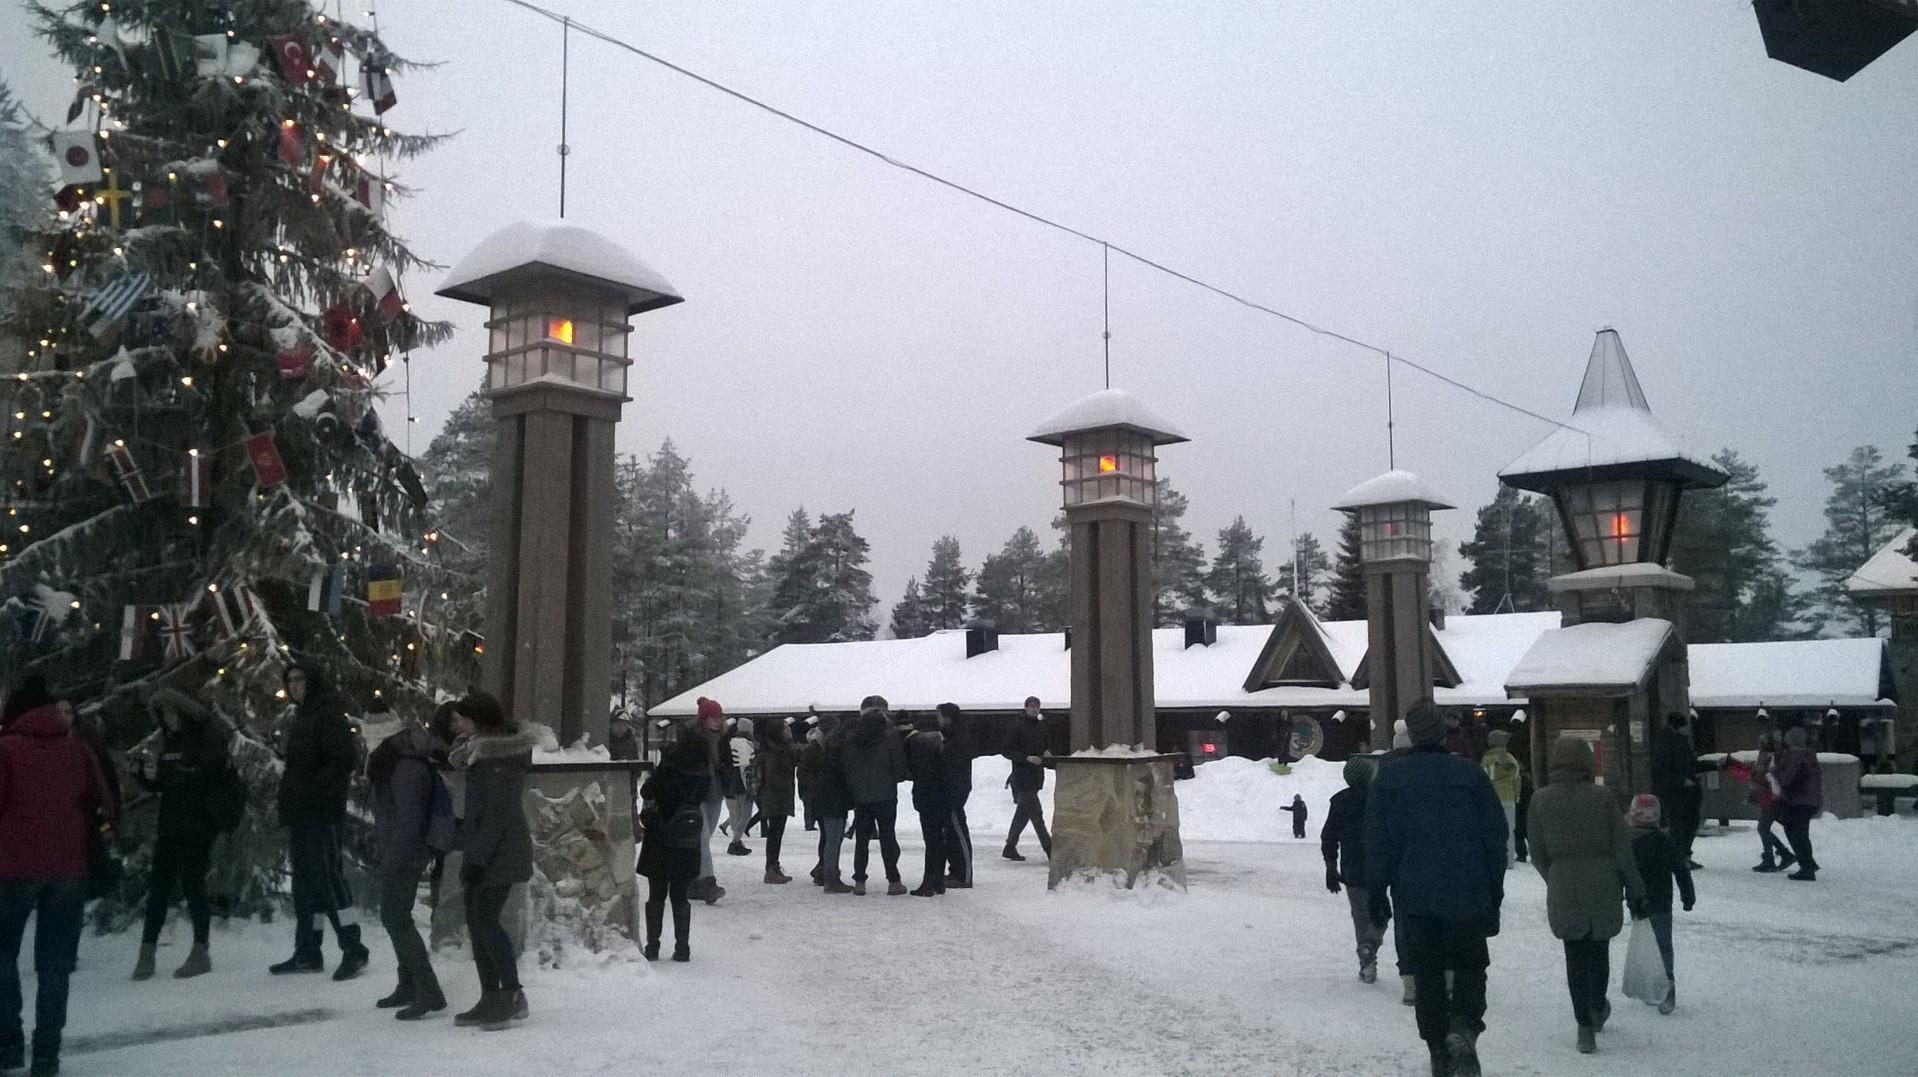 viajes-erasmus-laponia-finlandesa-i-ed37